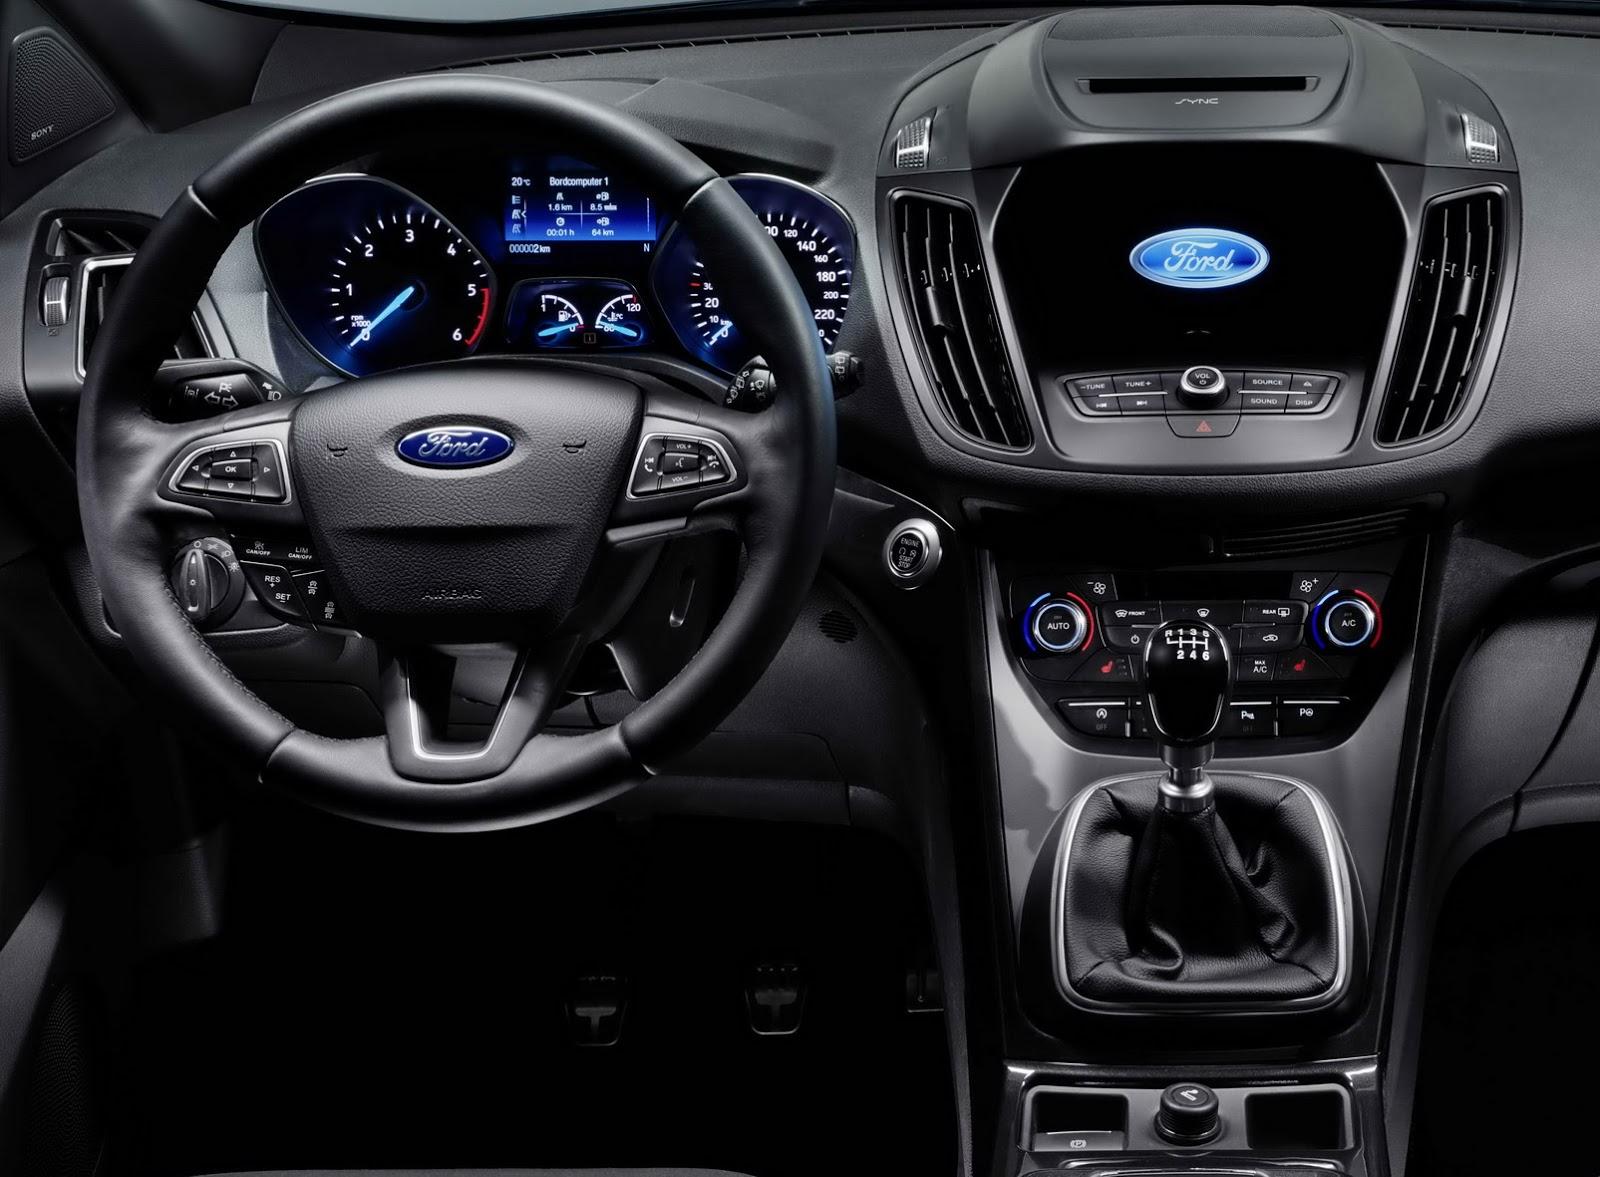 Фото Ford Kuga: фотографии Форд Куга, кузовов, годов и ...